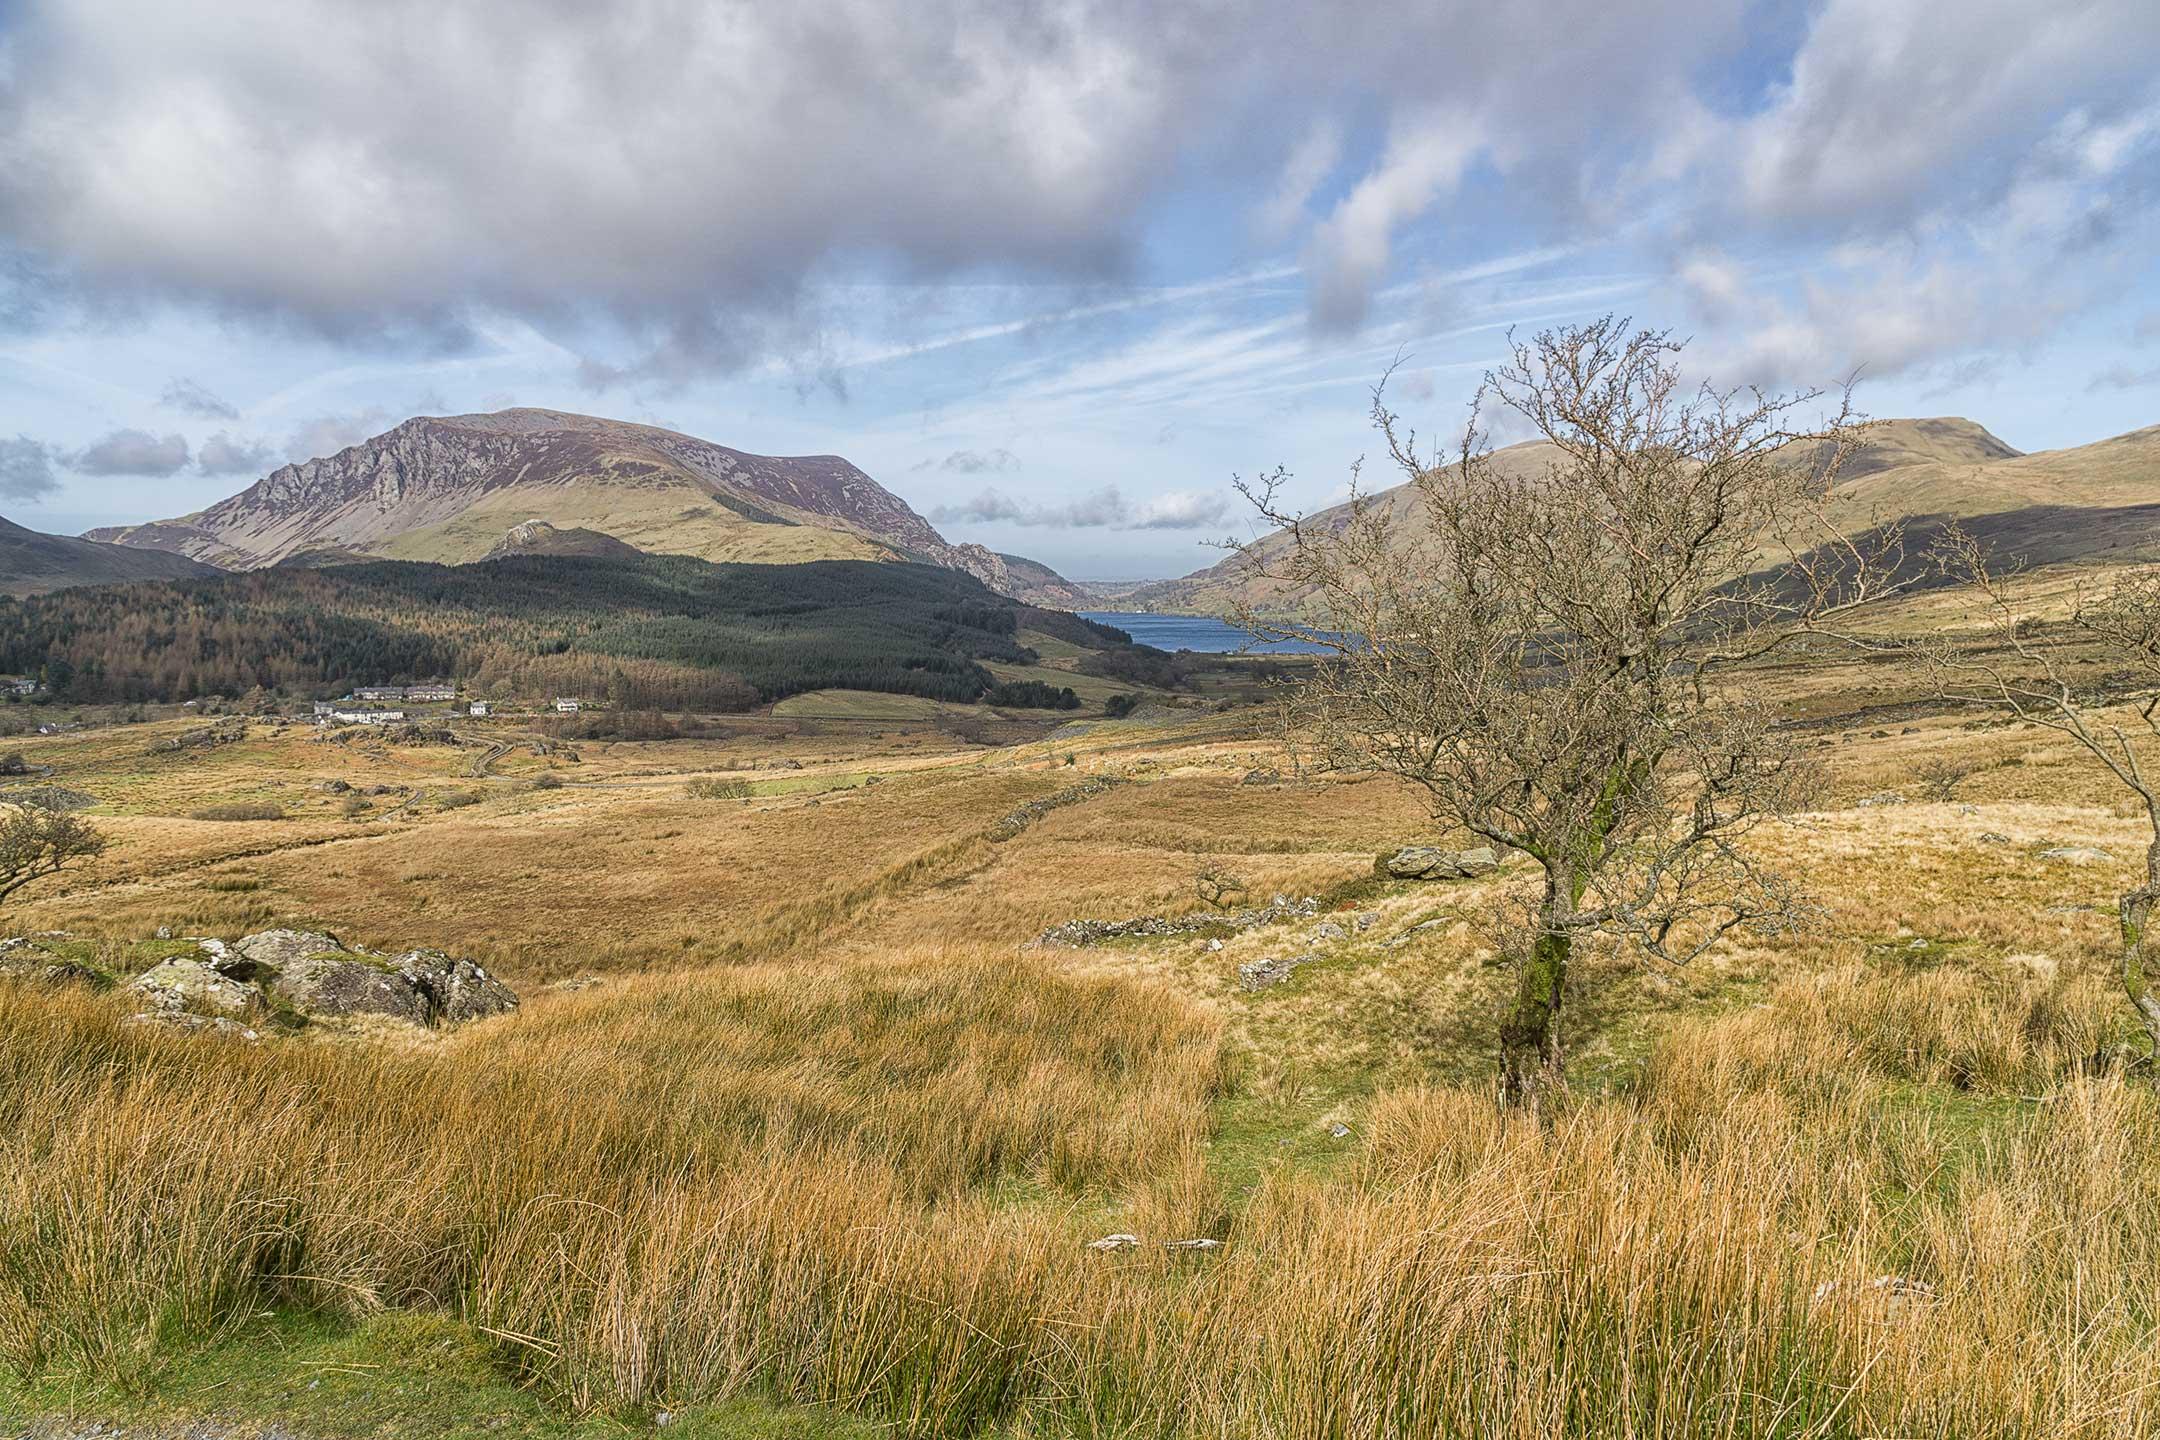 Snowdonia National Park - View from Rhyd Ddu Path